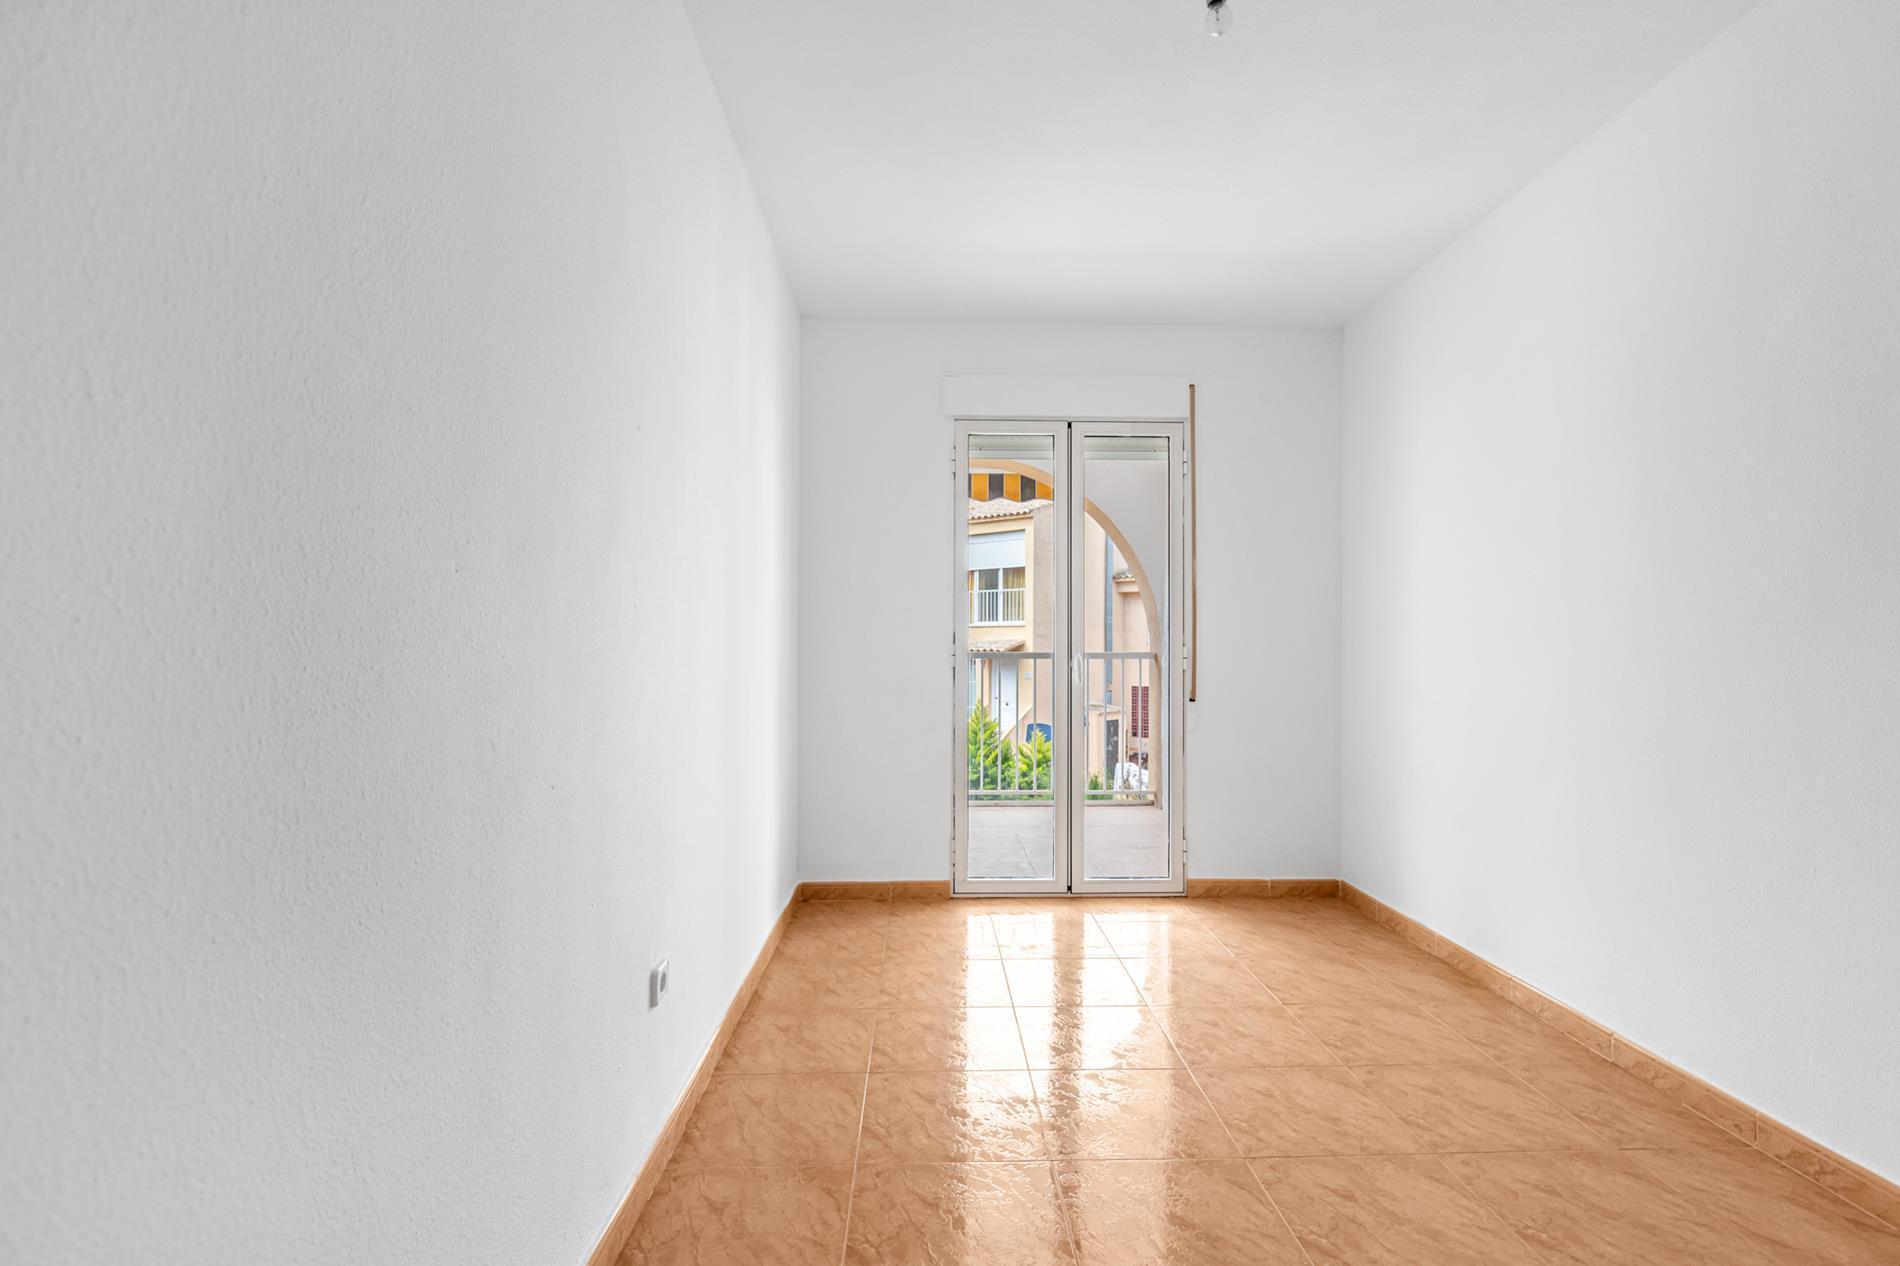 Apartamento en venta en Albir en bonita urbanizacion